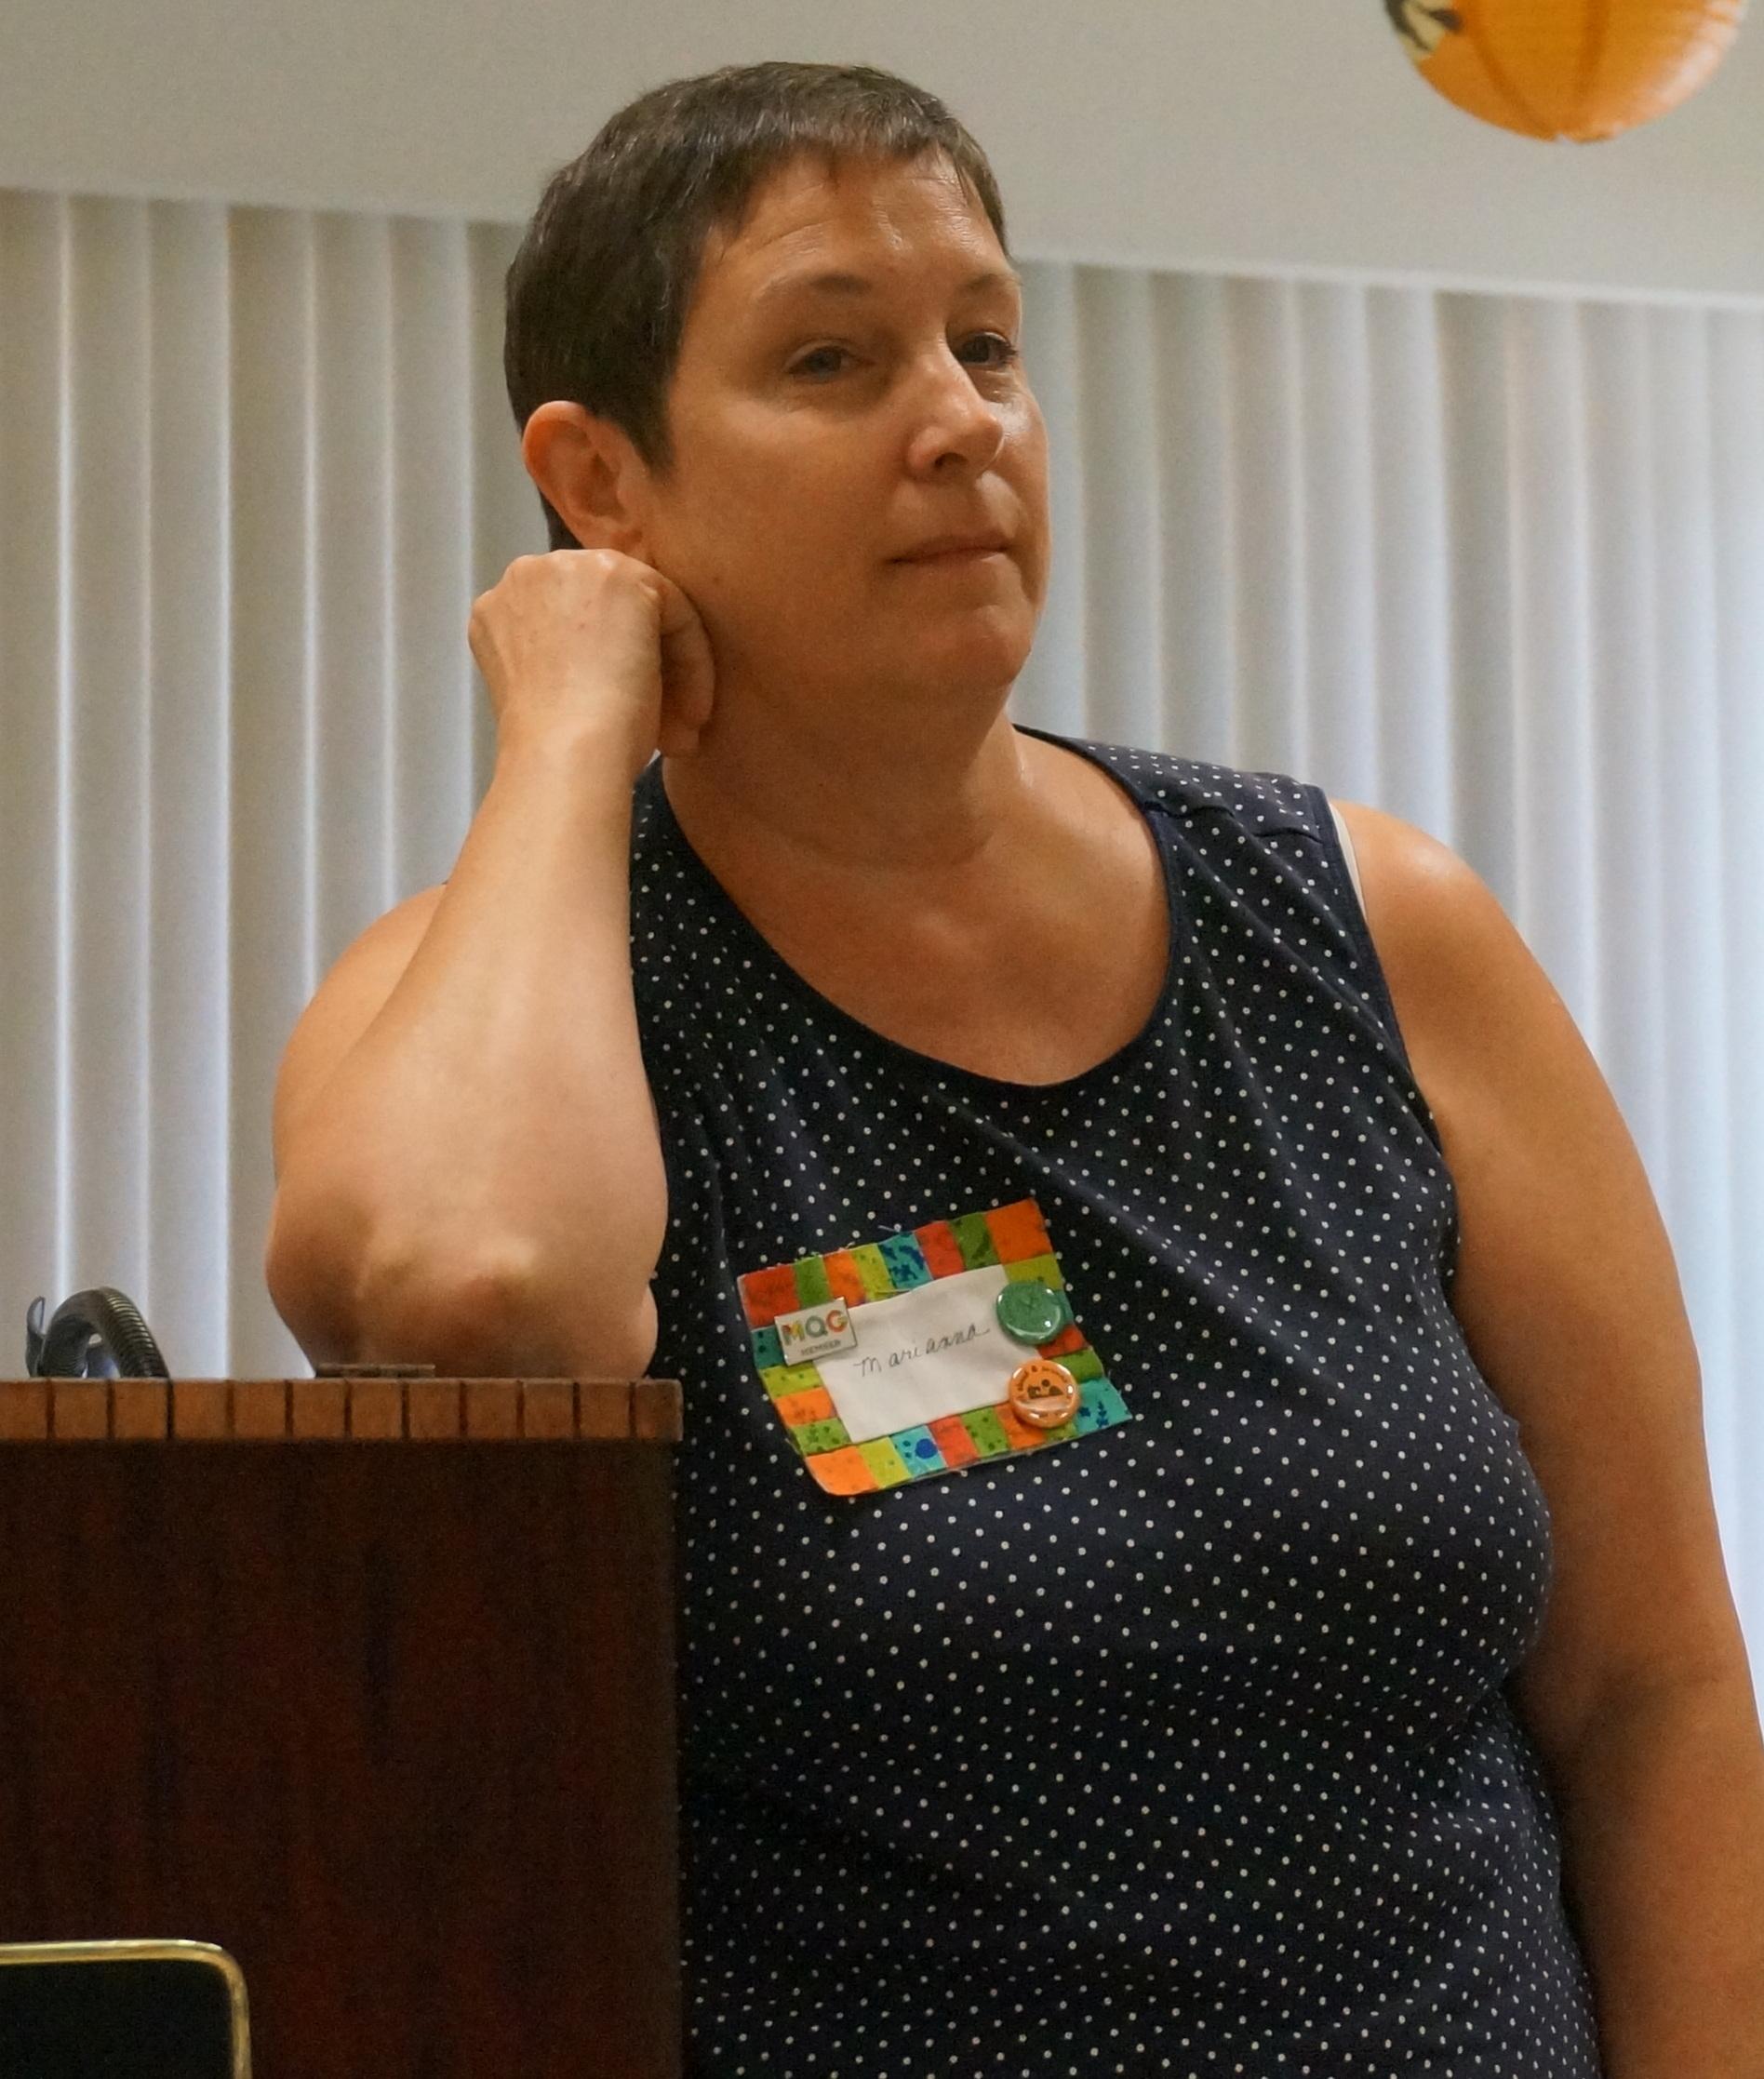 Treasurer candidate Marianna Steele